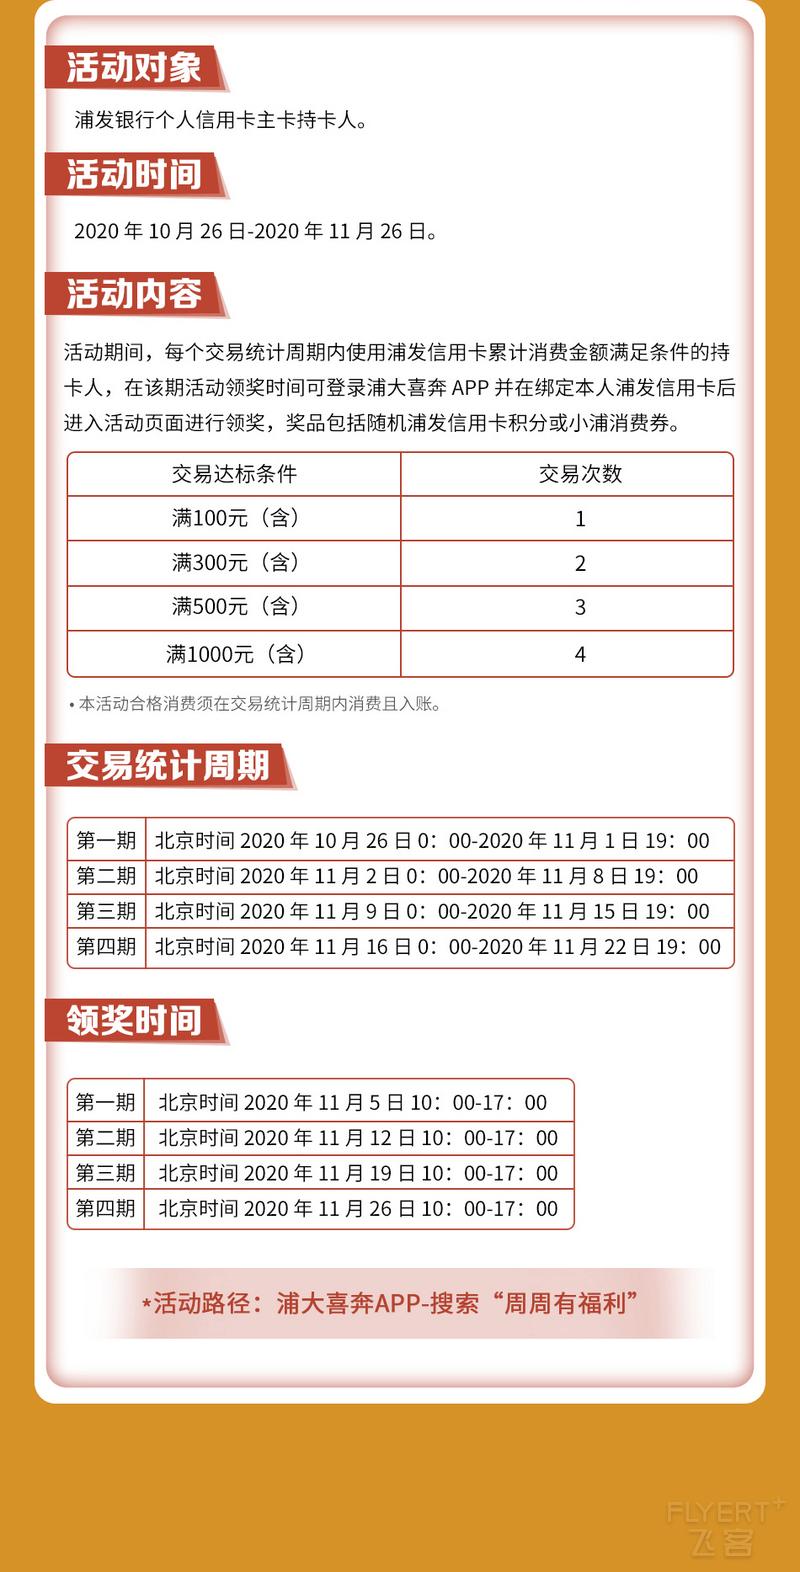 58dc1c76-05d3-420c-b9ae-a03181ee6573.png